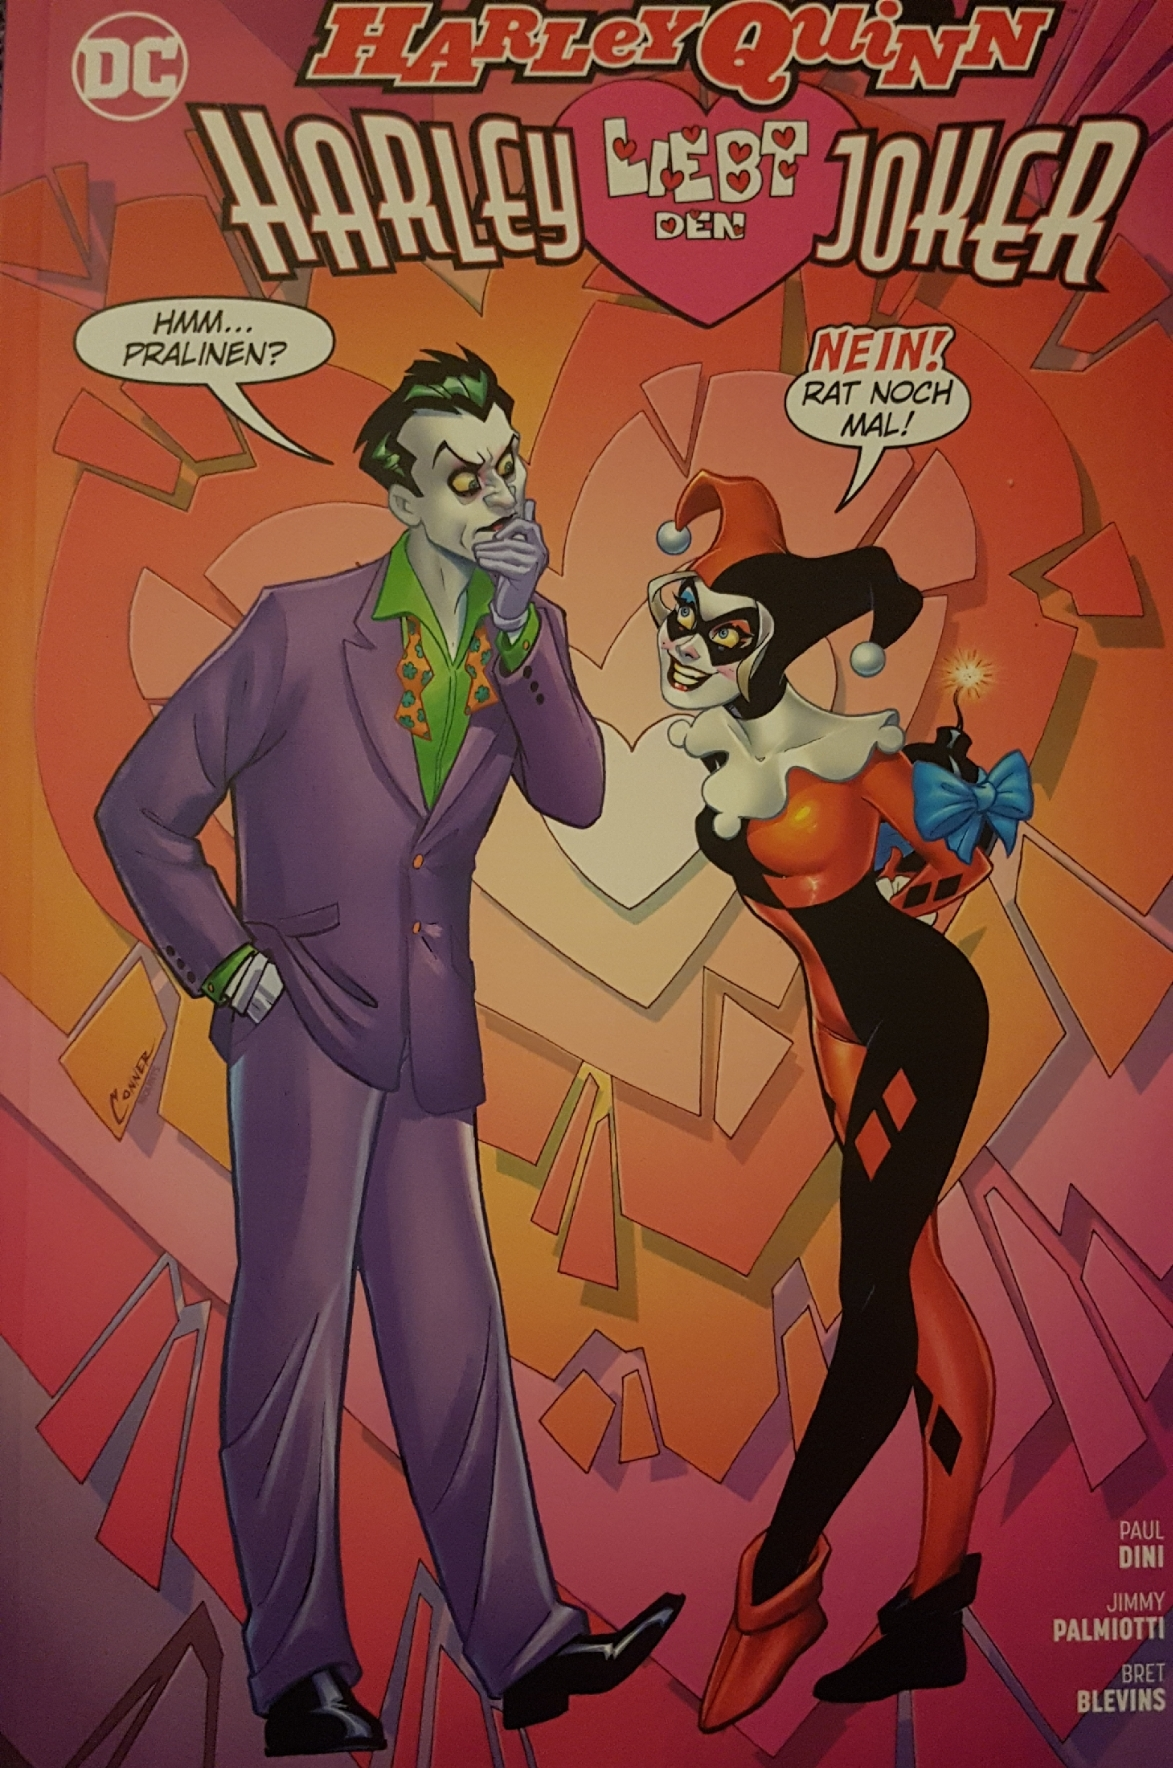 Harley liebt den Joker